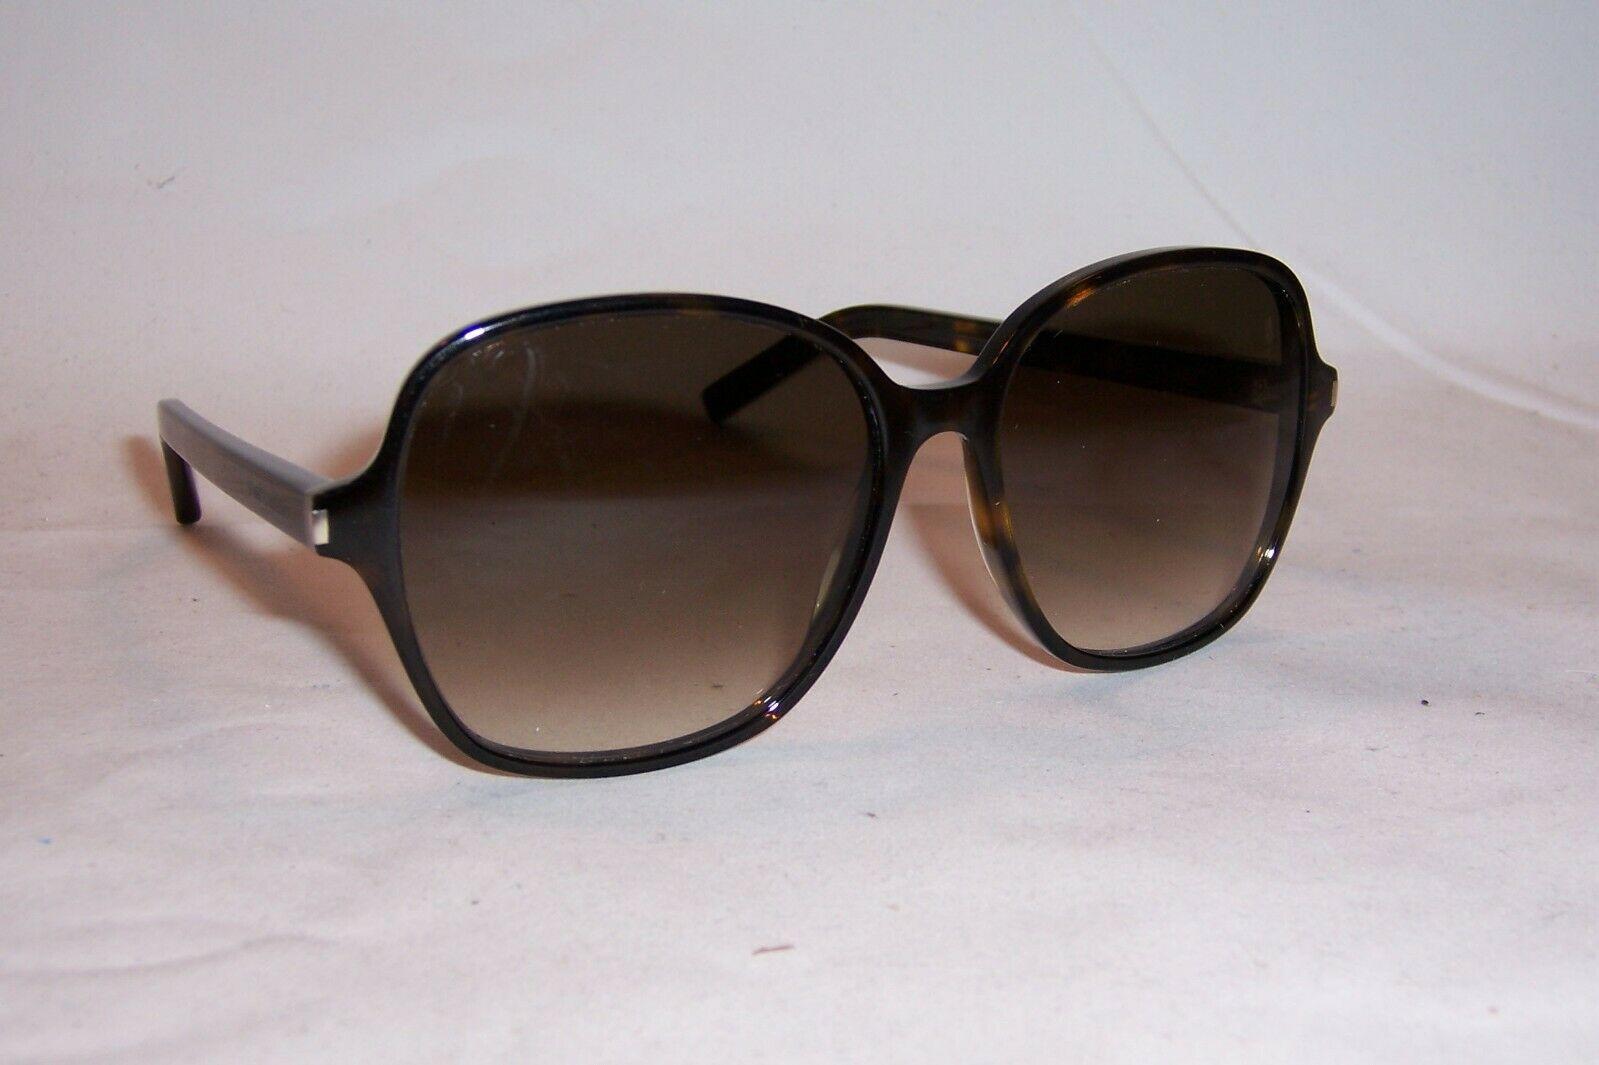 Saint Laurent玳瑁色棕色经典太阳眼镜墨镜SL 8 004